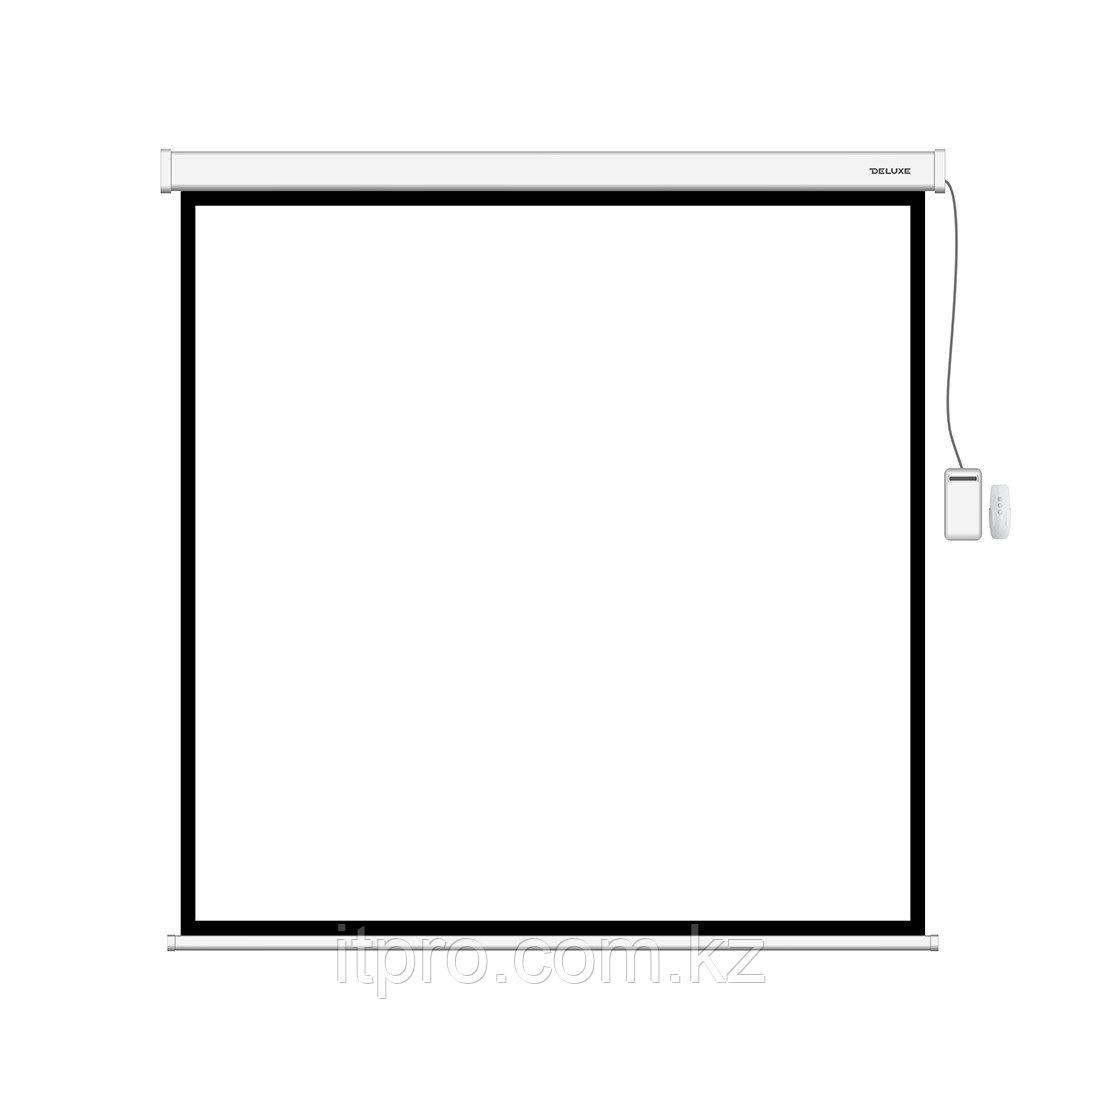 Экран моторизированный Deluxe DLS-ERC203x153W